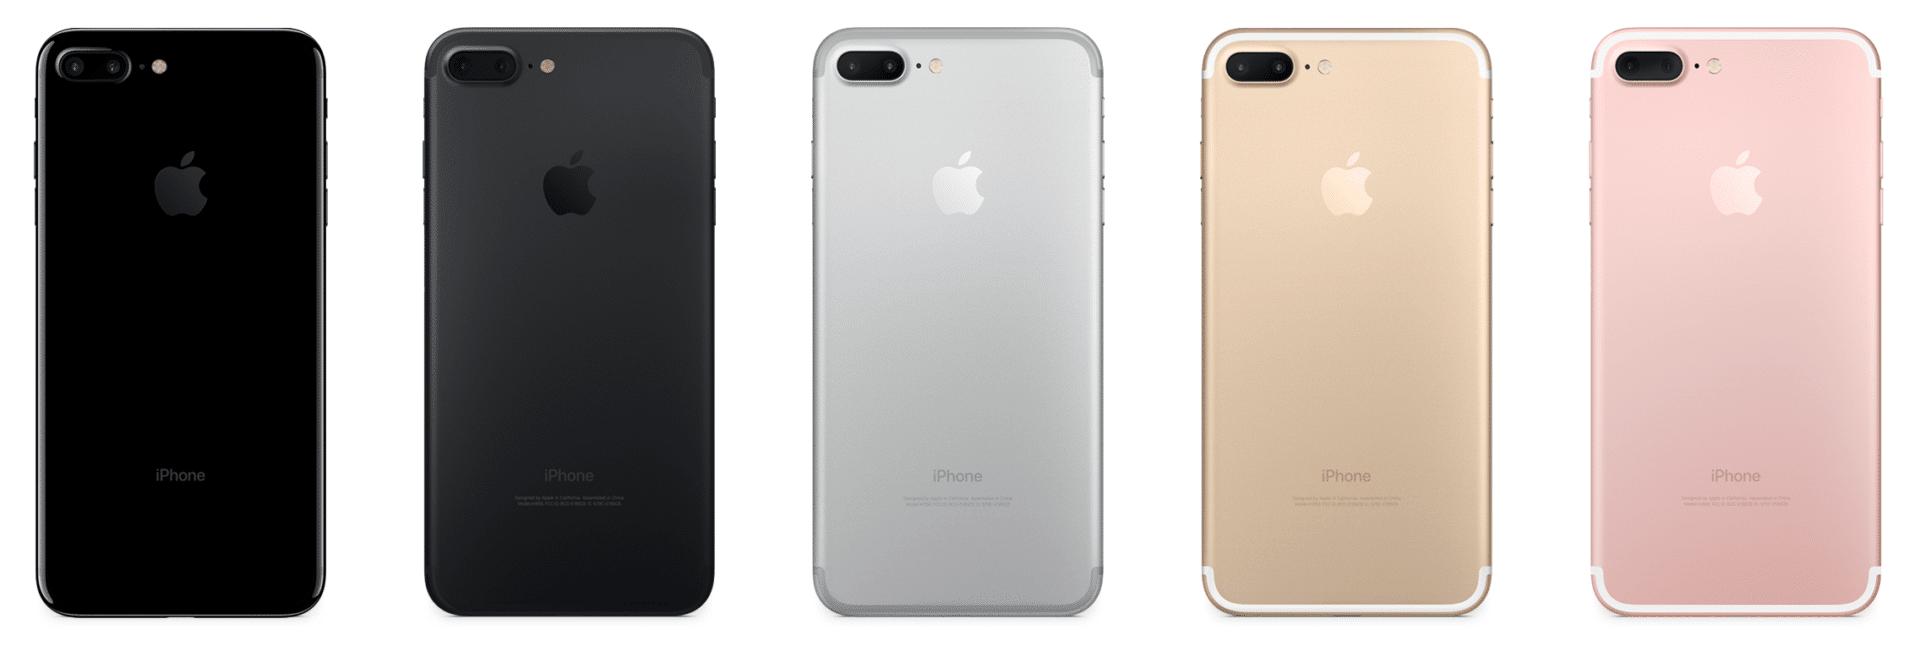 iphone-7-predni-strana-recenze